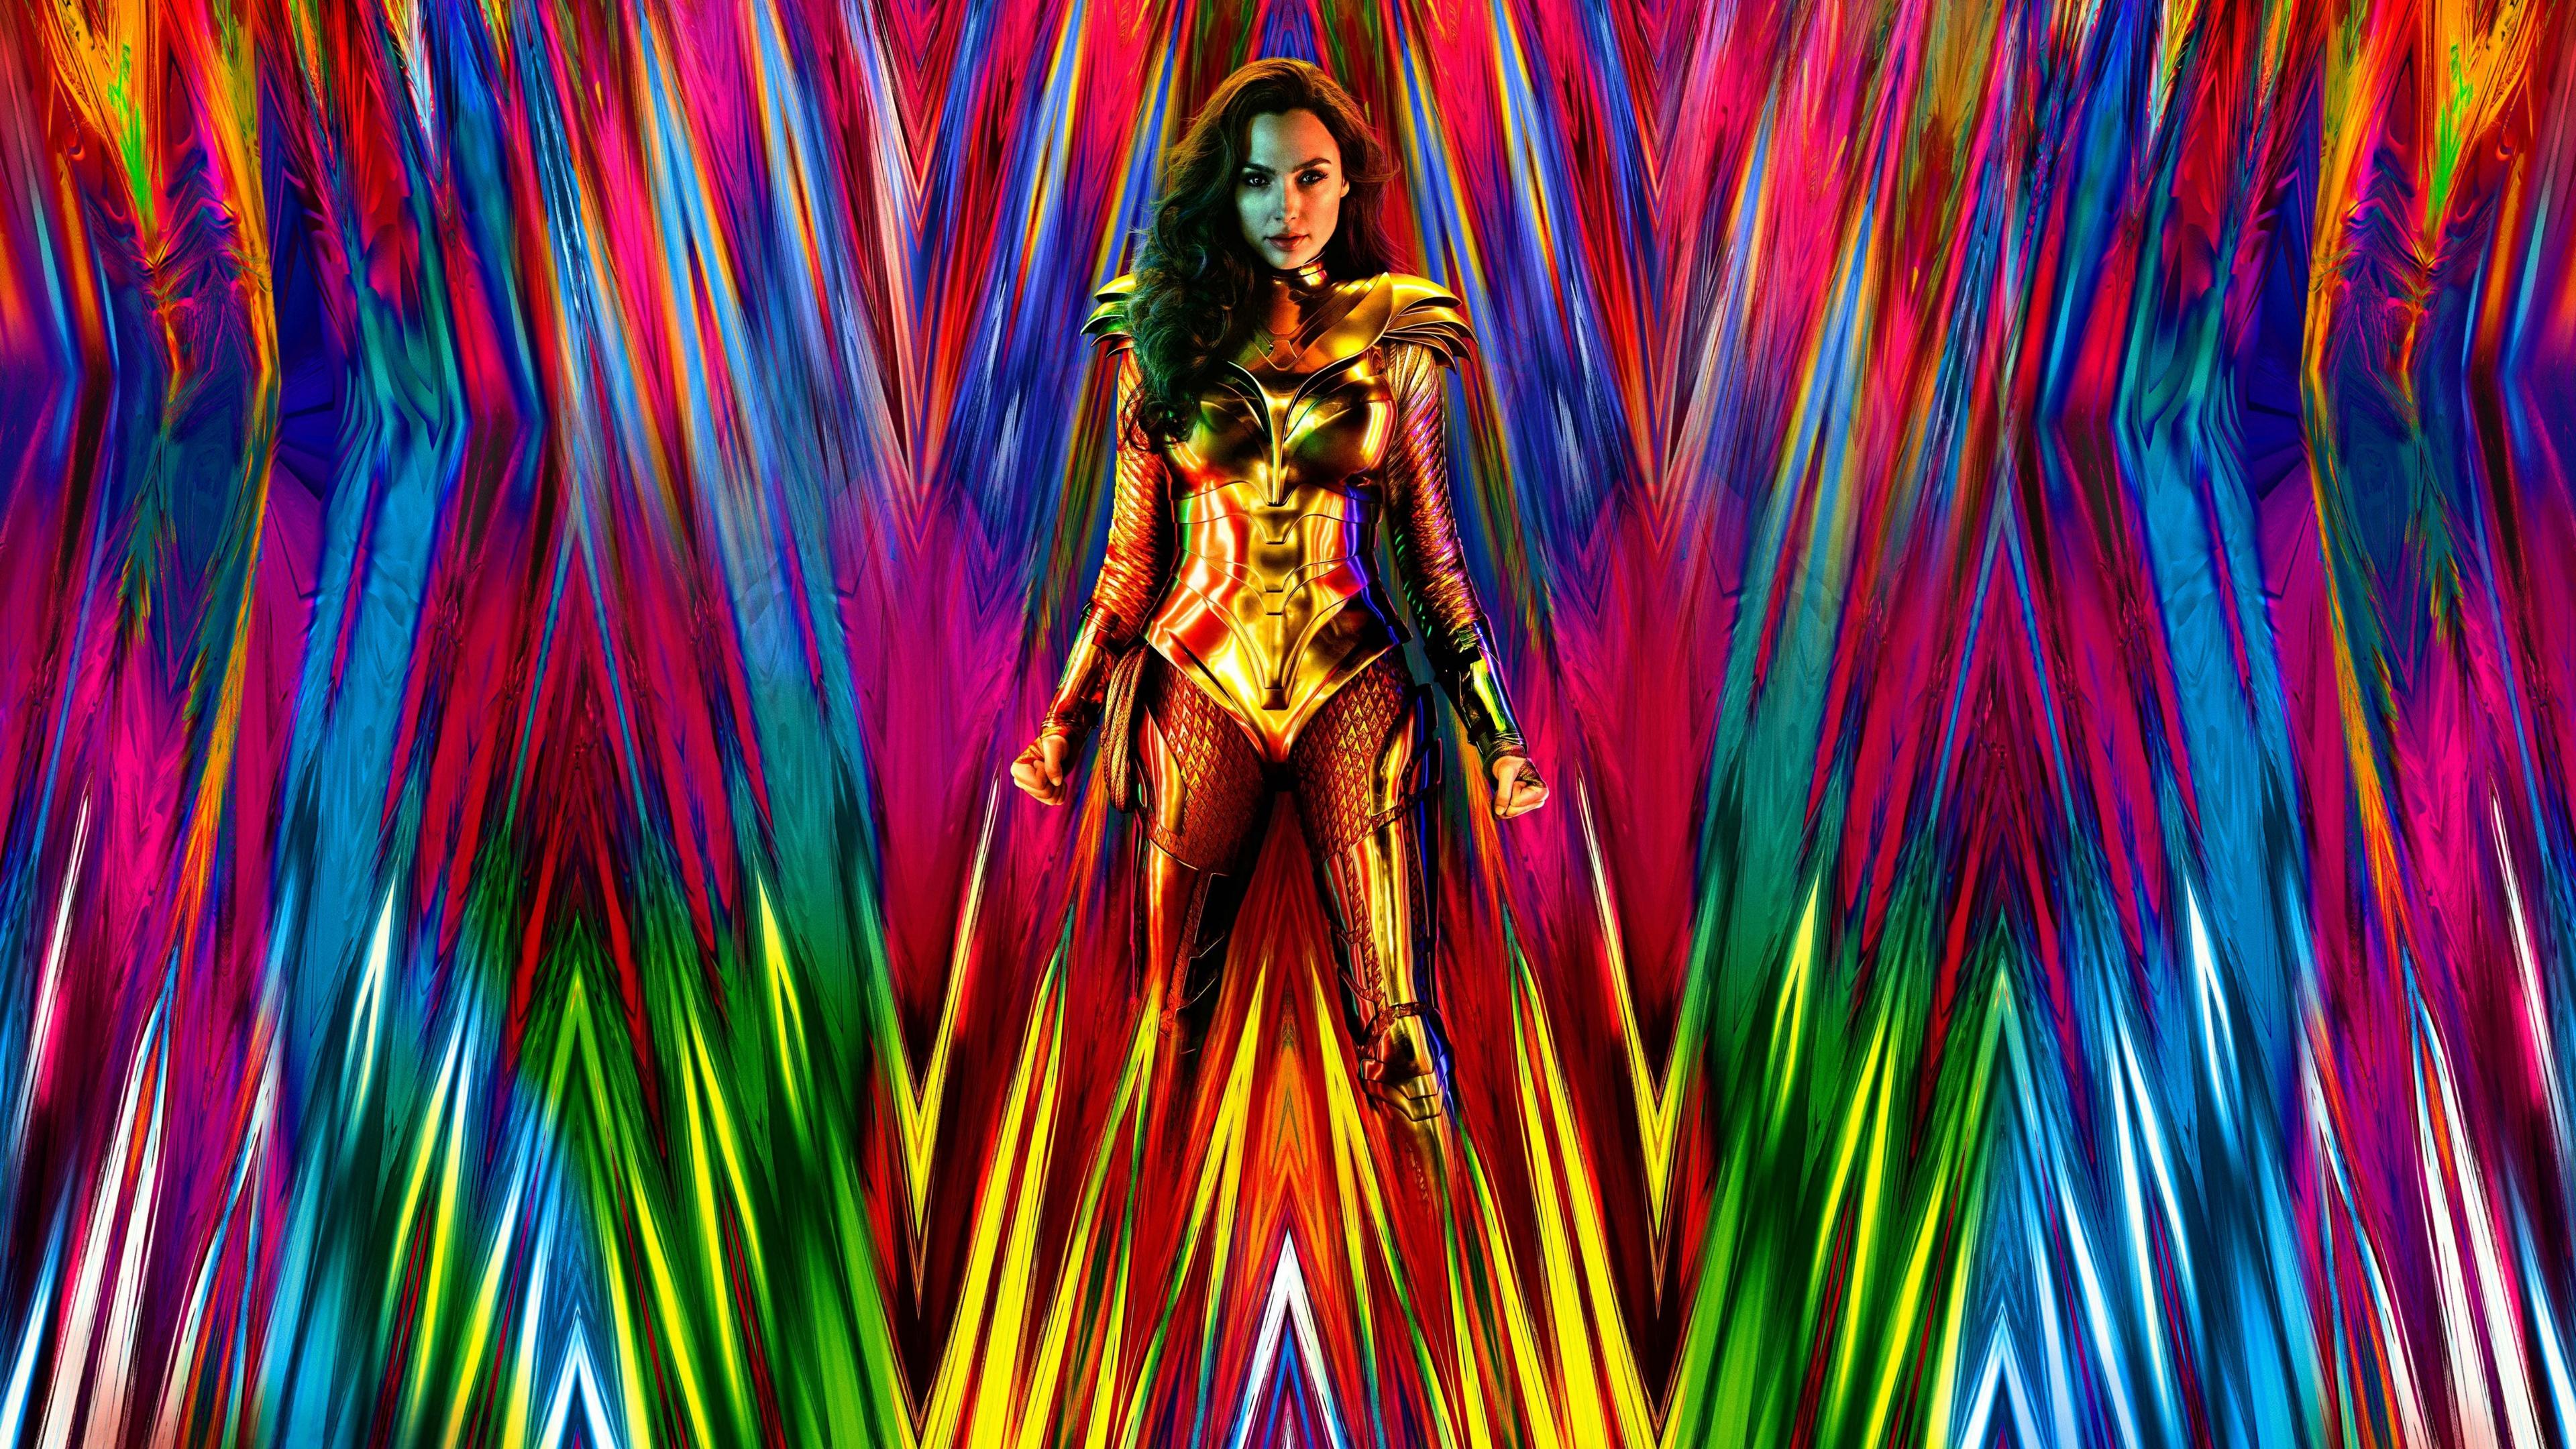 wonder woman 1984 1562107128 - Wonder Woman 1984 - wonder woman wallpapers, wonder woman 2 wallpapers, wonder woman 1984 wallpapers, movies wallpapers, hd-wallpapers, gal gadot wallpapers, 8k wallpapers, 5k wallpapers, 4k-wallpapers, 2020 movies wallpapers